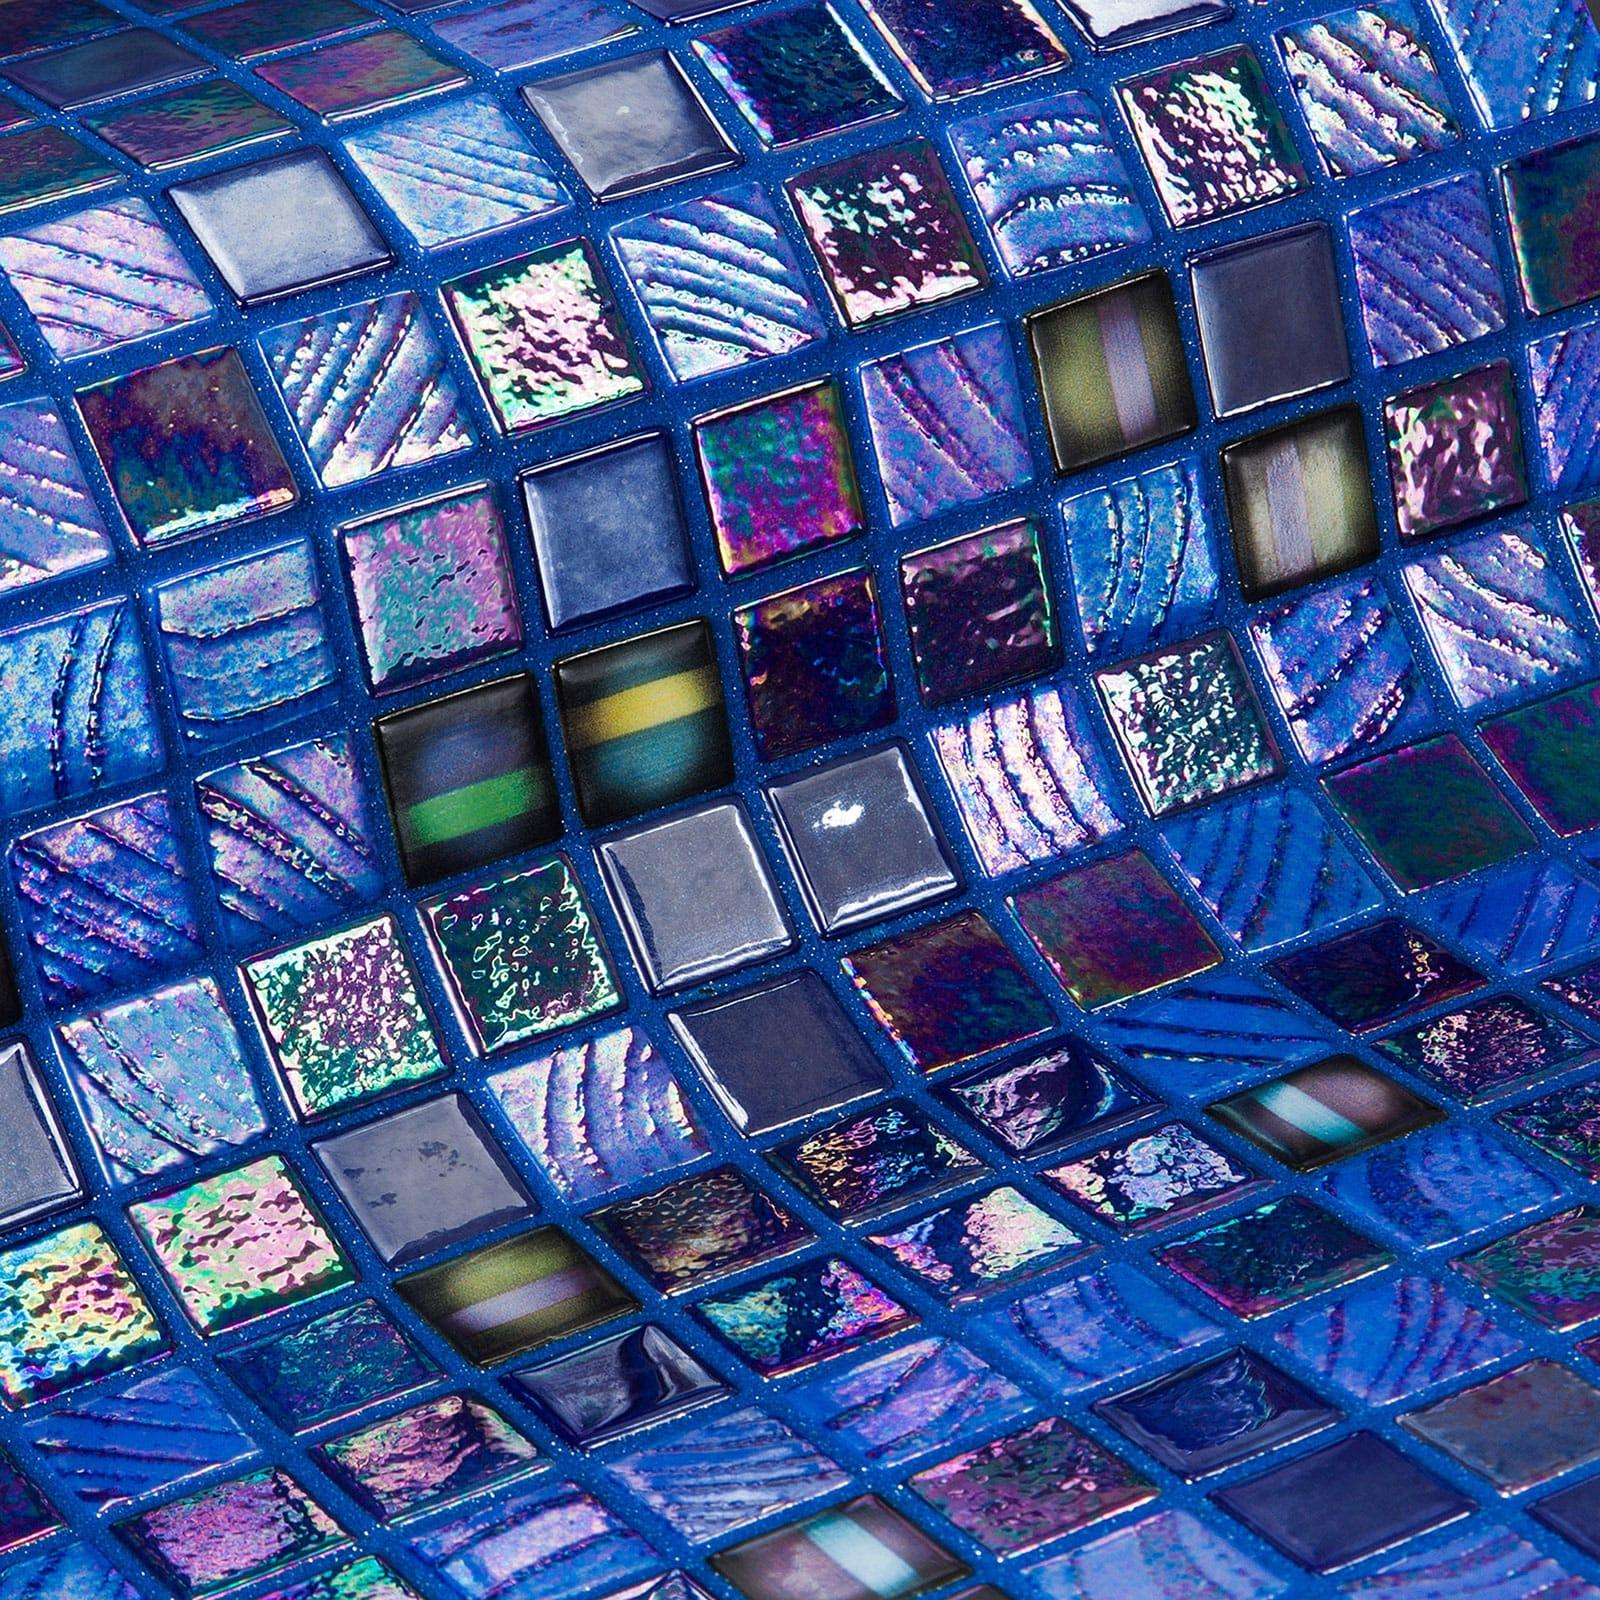 16-Grapes-Topping-Mosaic-Ezarri.jpg